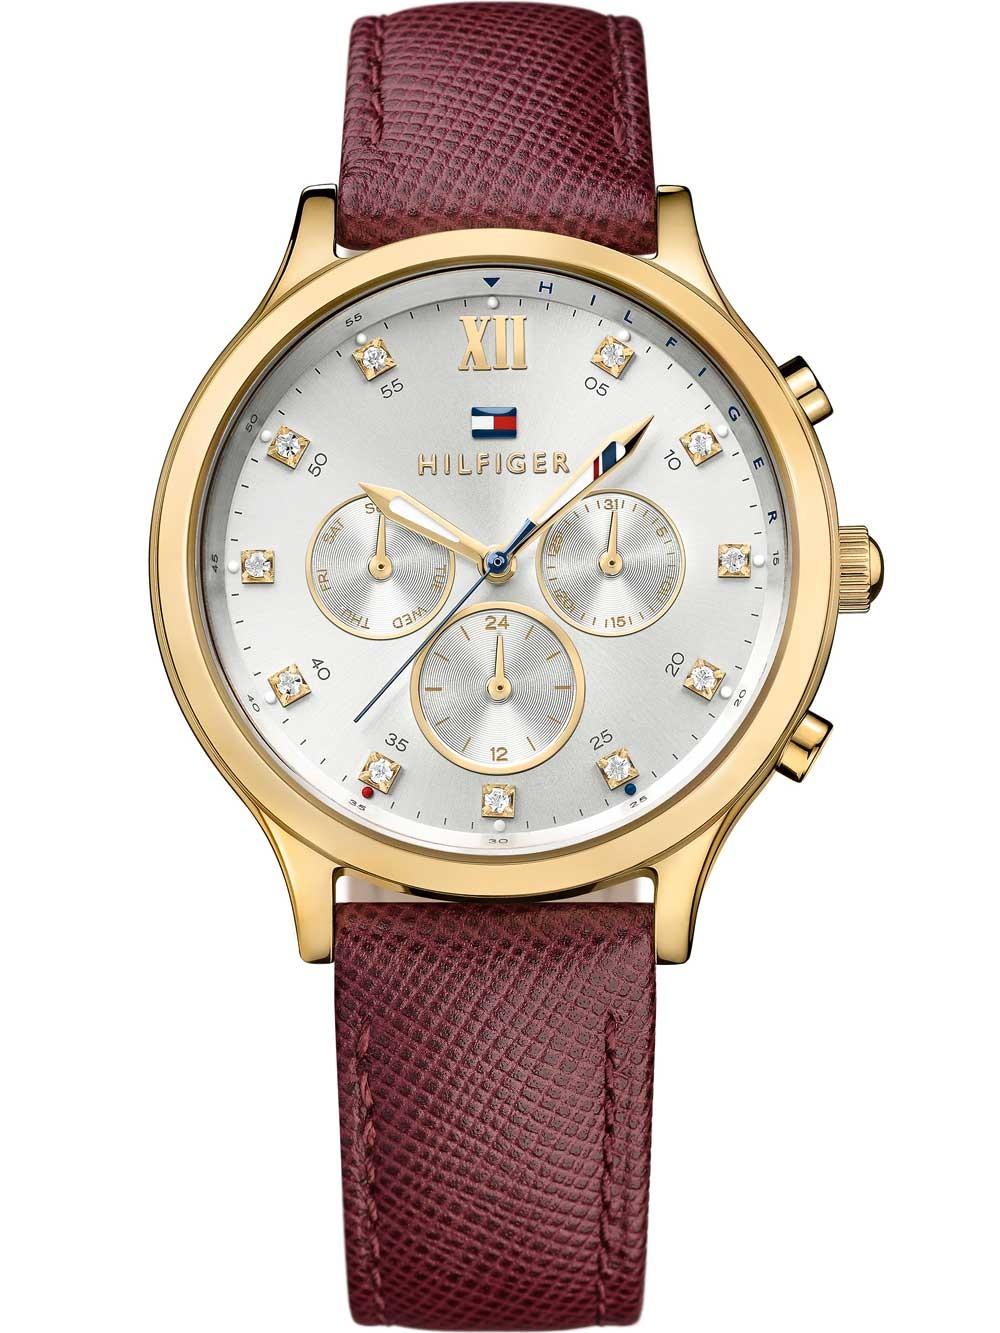 watches chrono12 tommy hilfiger 1781614 damenuhr 39mm 3atm. Black Bedroom Furniture Sets. Home Design Ideas